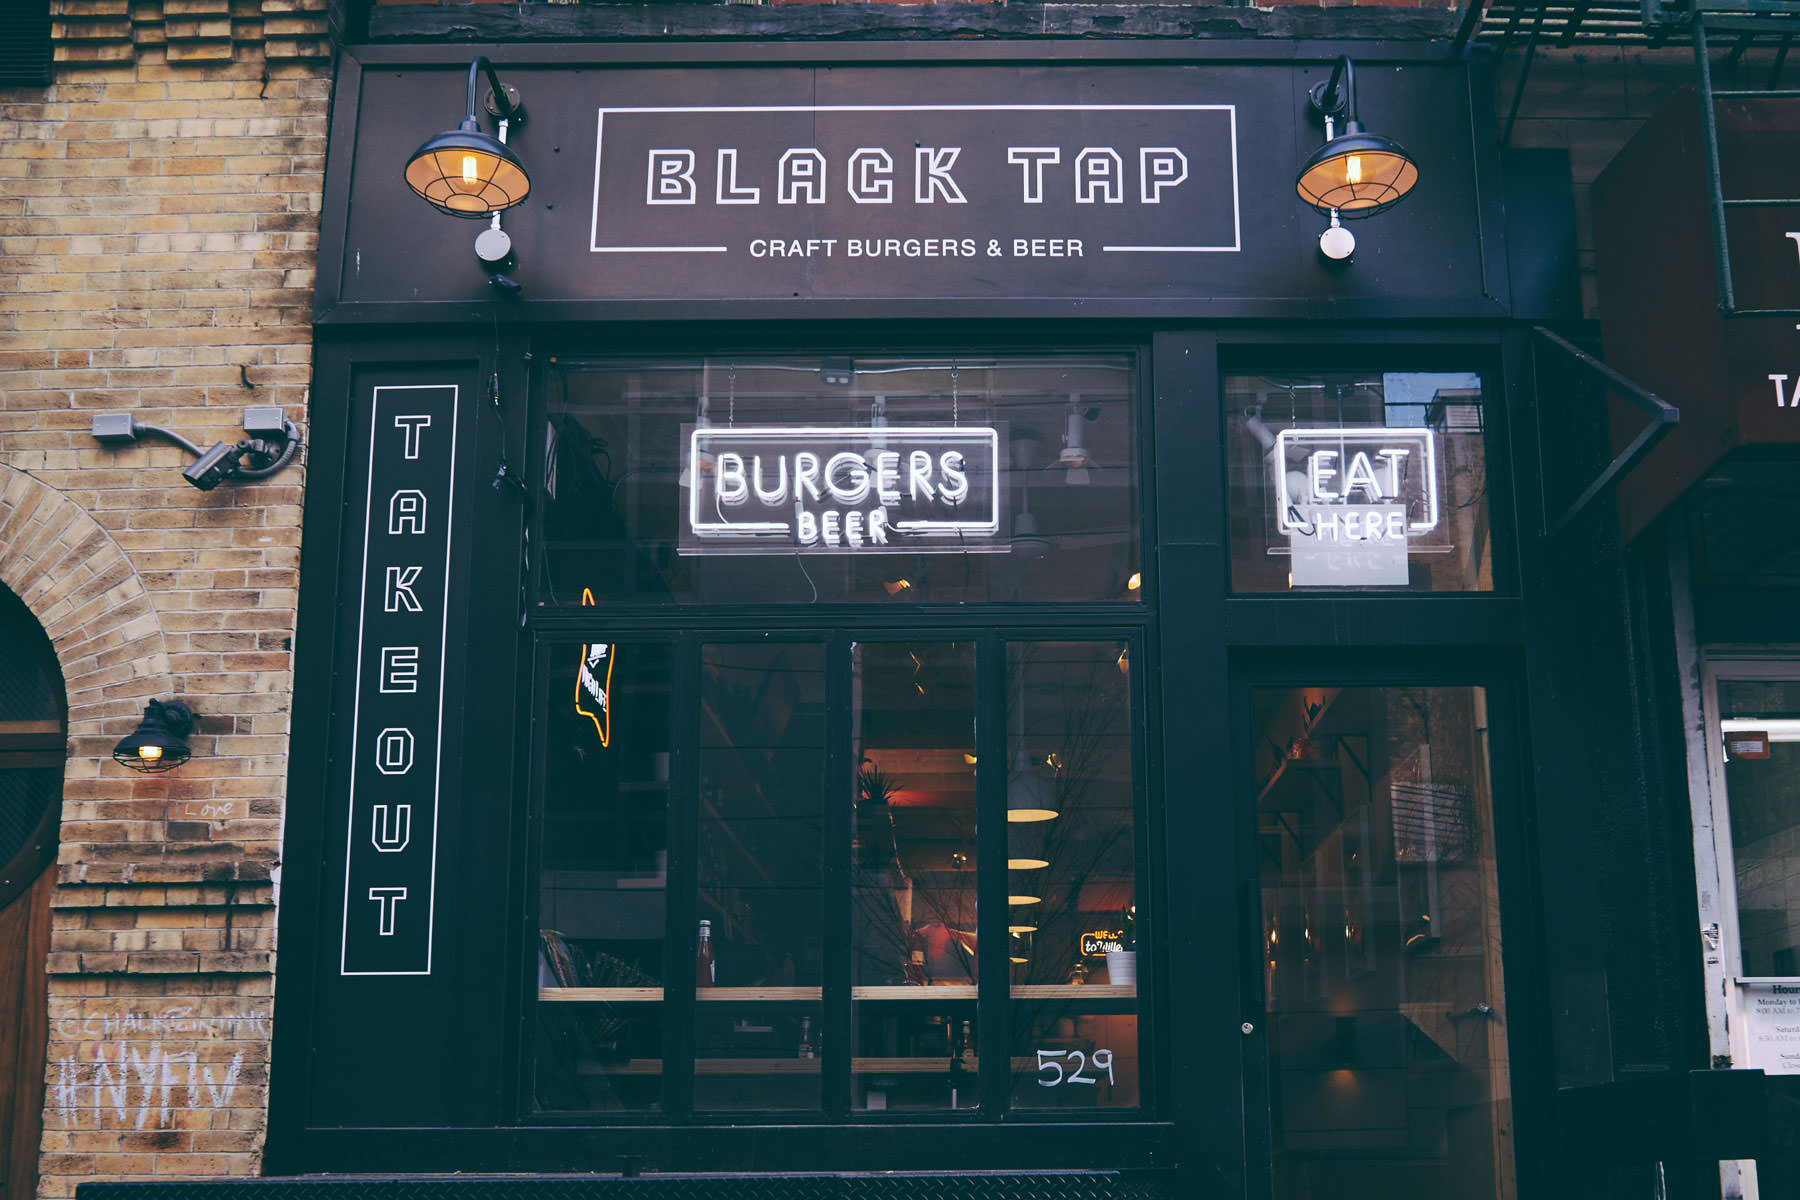 black-tap-nyc-nova-york-dica-viagem-travel-tips-restaurante-milkshake-hamburguer-cerveja-beer-burger